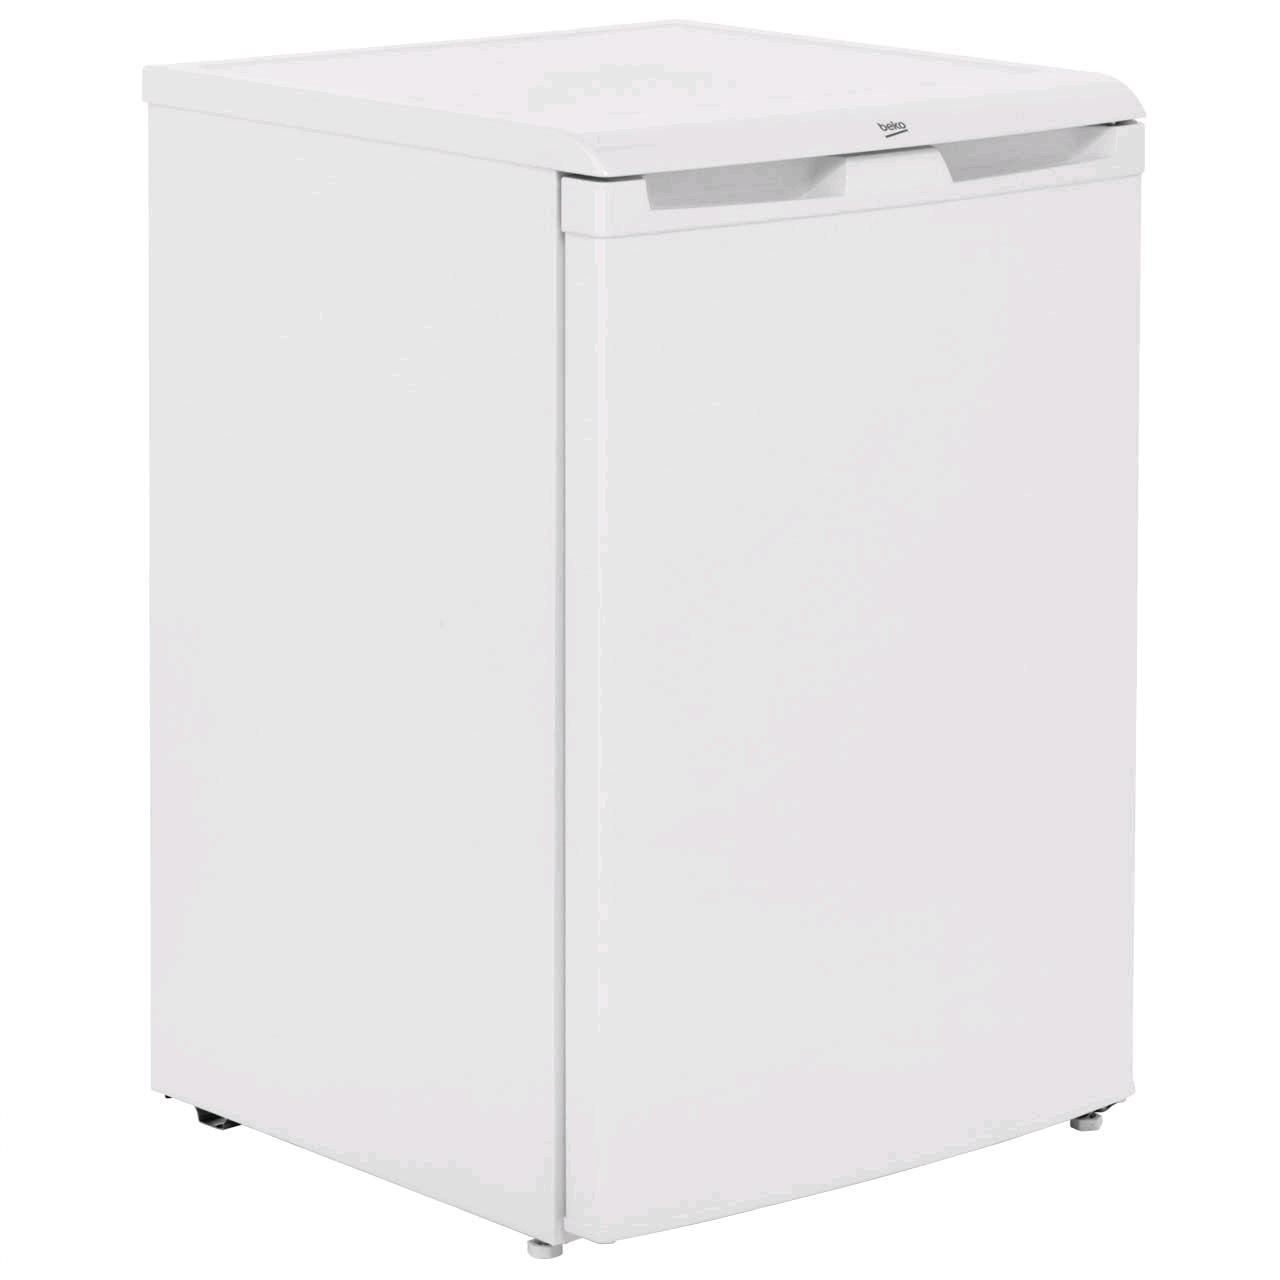 Beko Undercounter Freezer Frost Free 75L